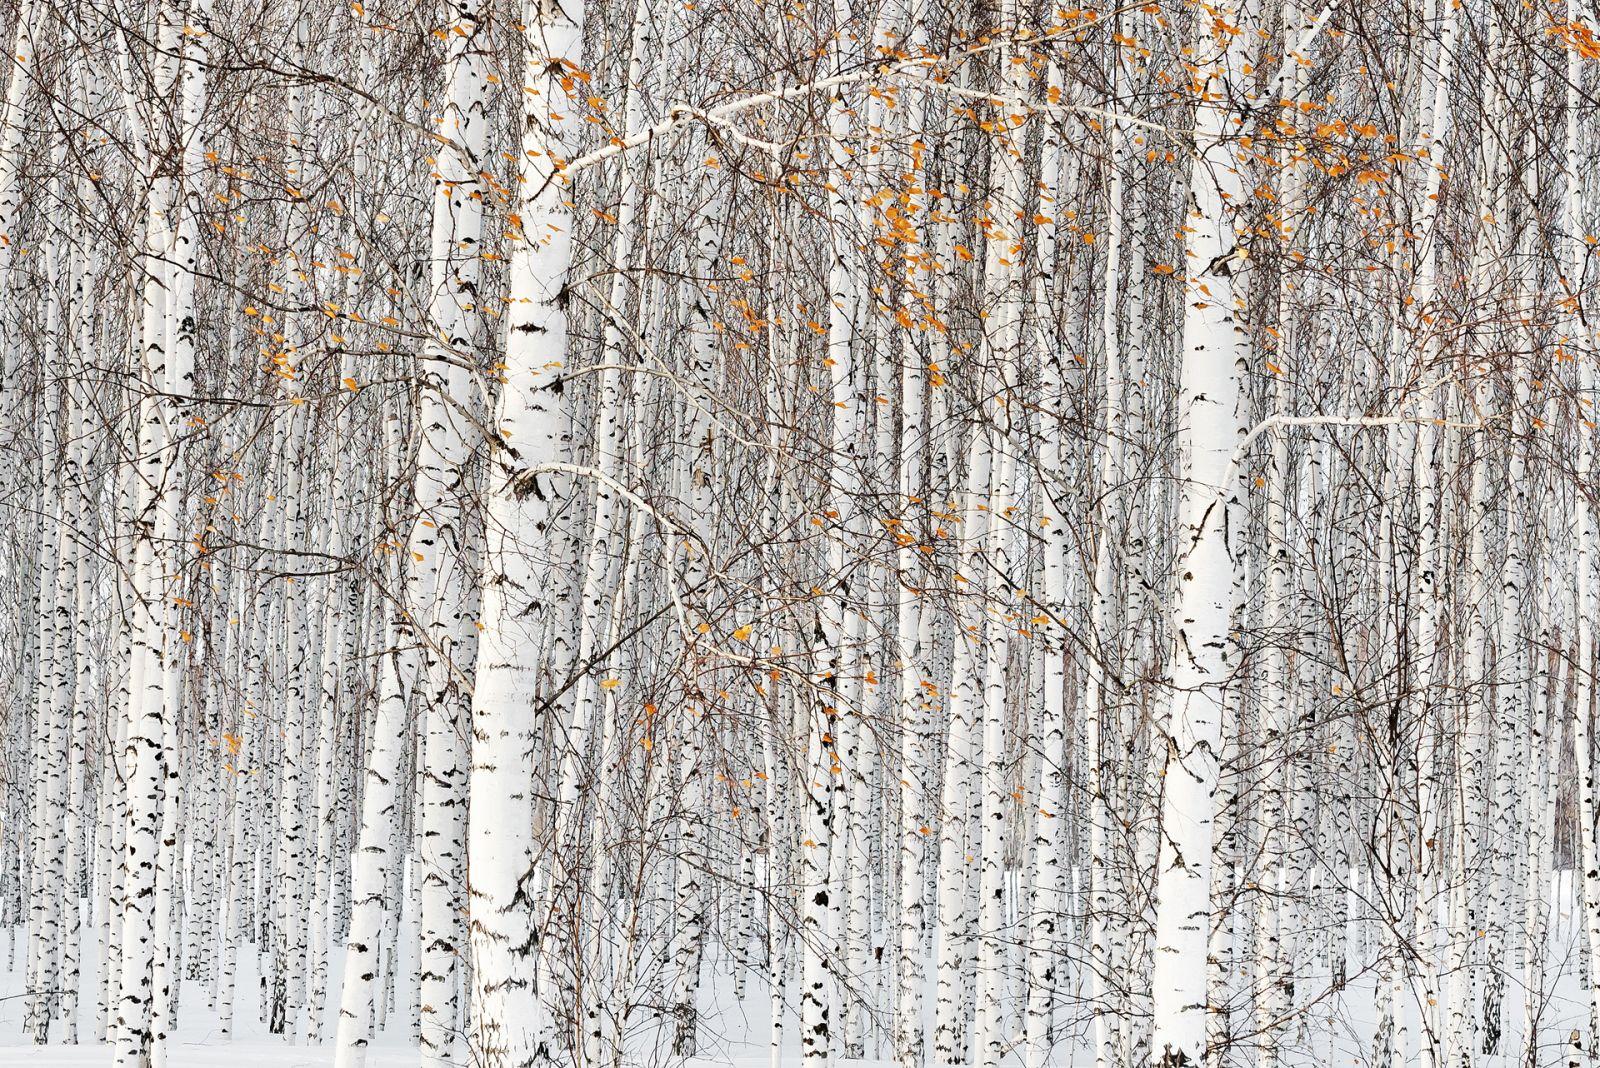 Березки, © Надежда Моисеева, Финалист фотоконкурса «Самая красивая страна – 2018»